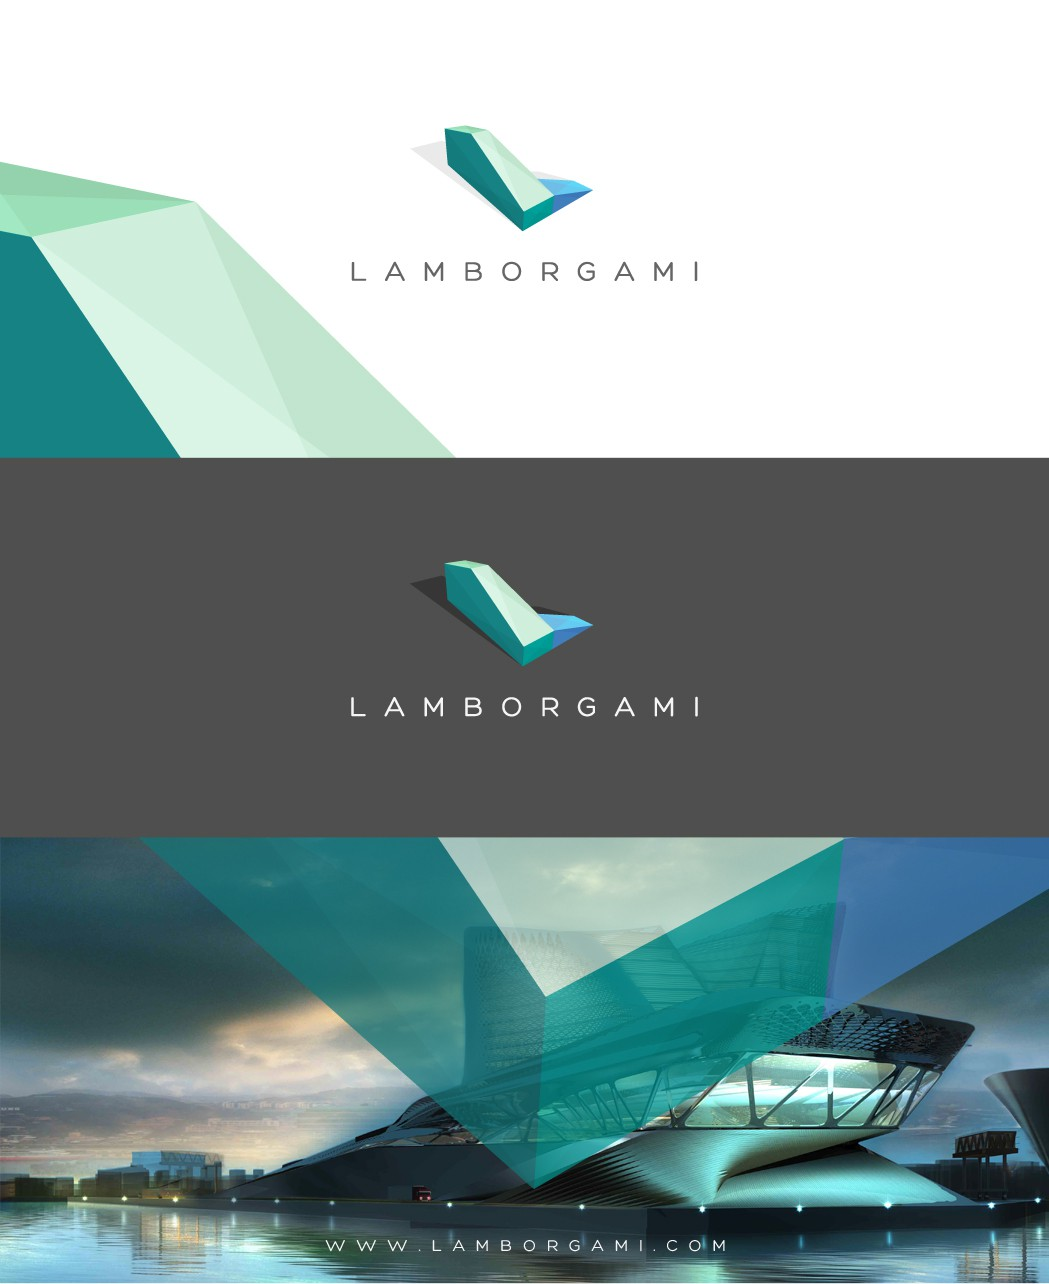 New Logo for ultra modern prefabricated-modular-knockdownable aerodynamic origamic architecture